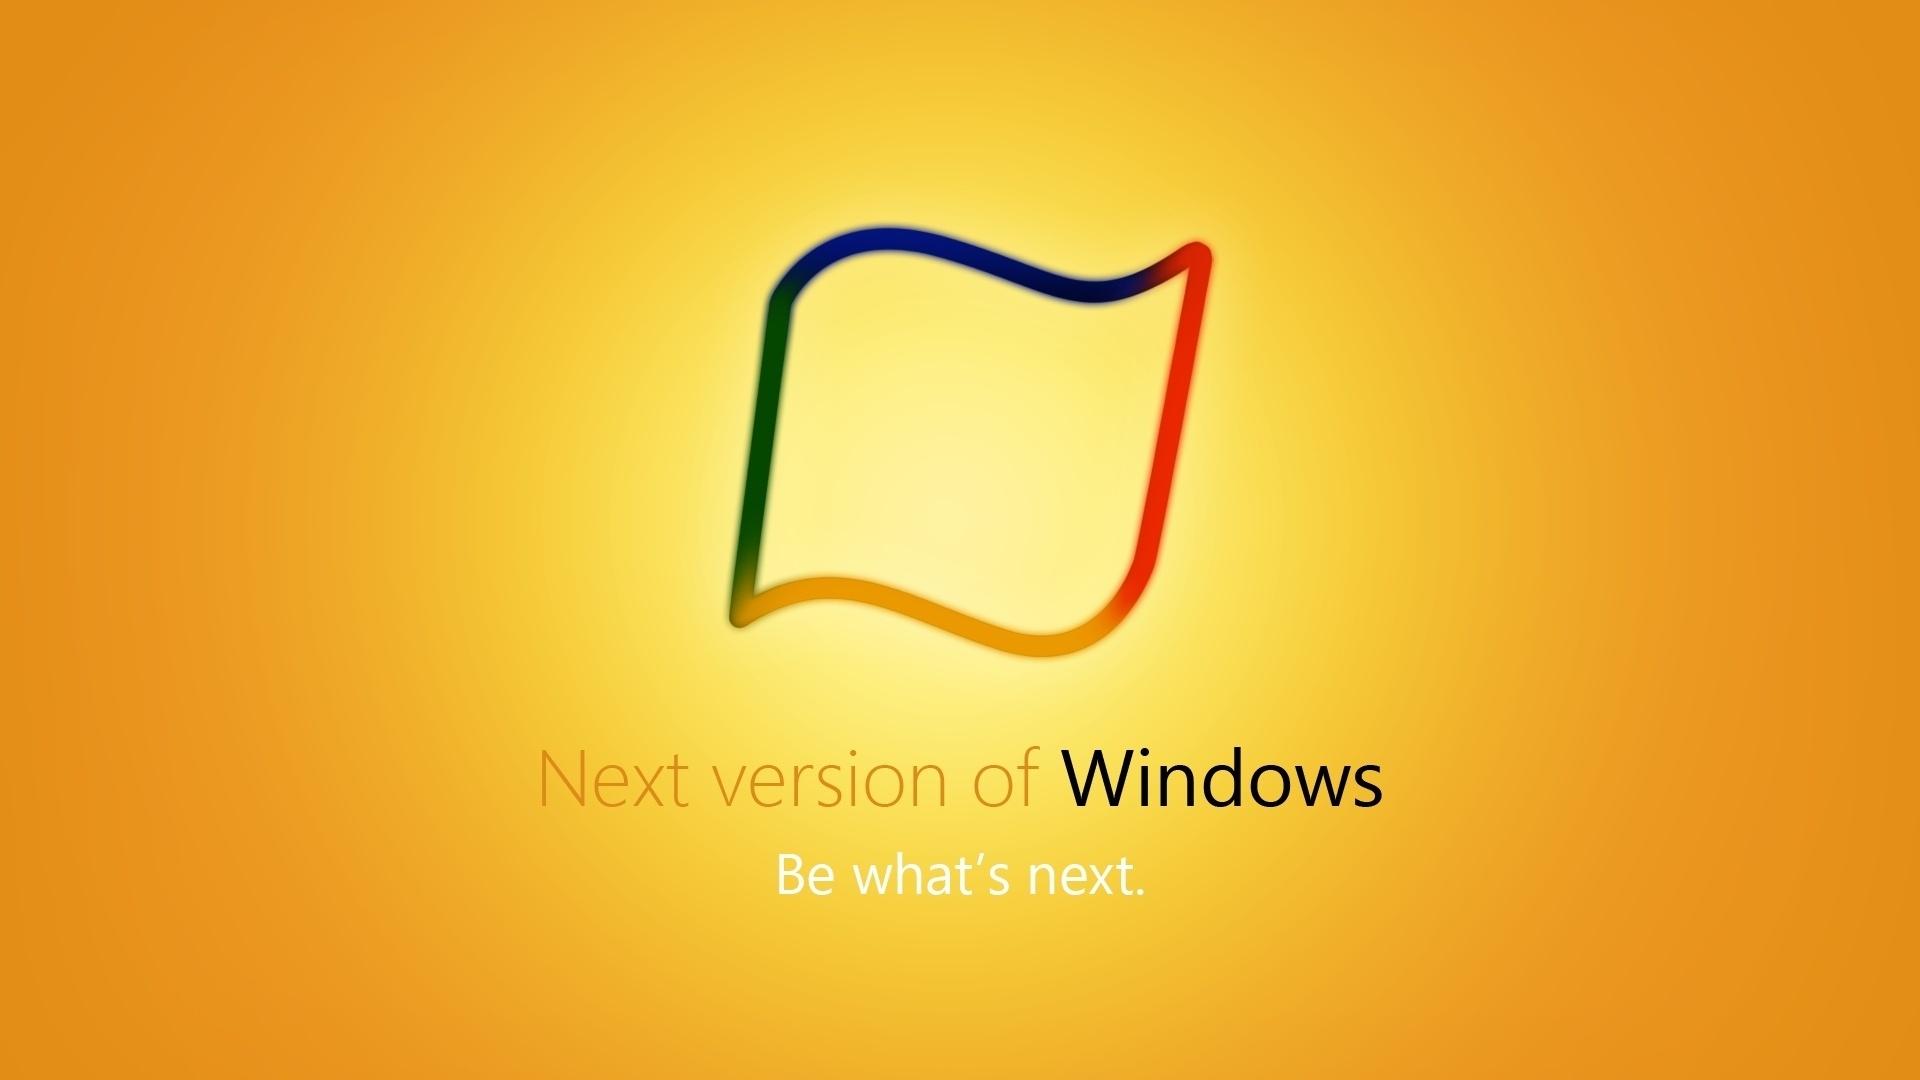 http://1.bp.blogspot.com/-XVoSXx-LyHg/UHVnDGslXQI/AAAAAAAAL0Q/lRLQRQoreKY/s0/next-windows-8-1920x1080-wallpaper.jpg